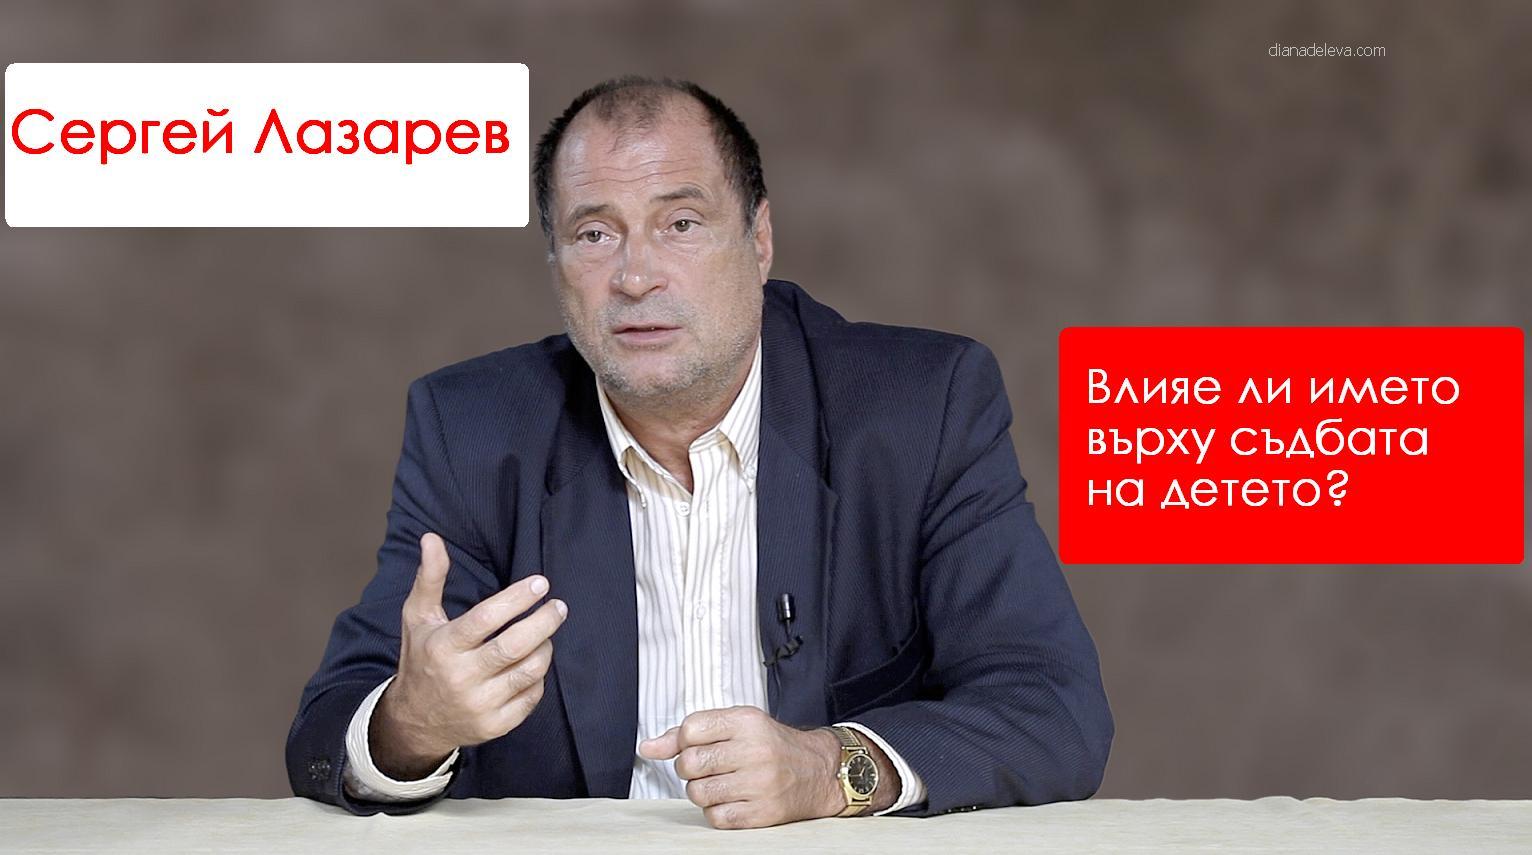 Сергей Лазарев как влияе името на детето